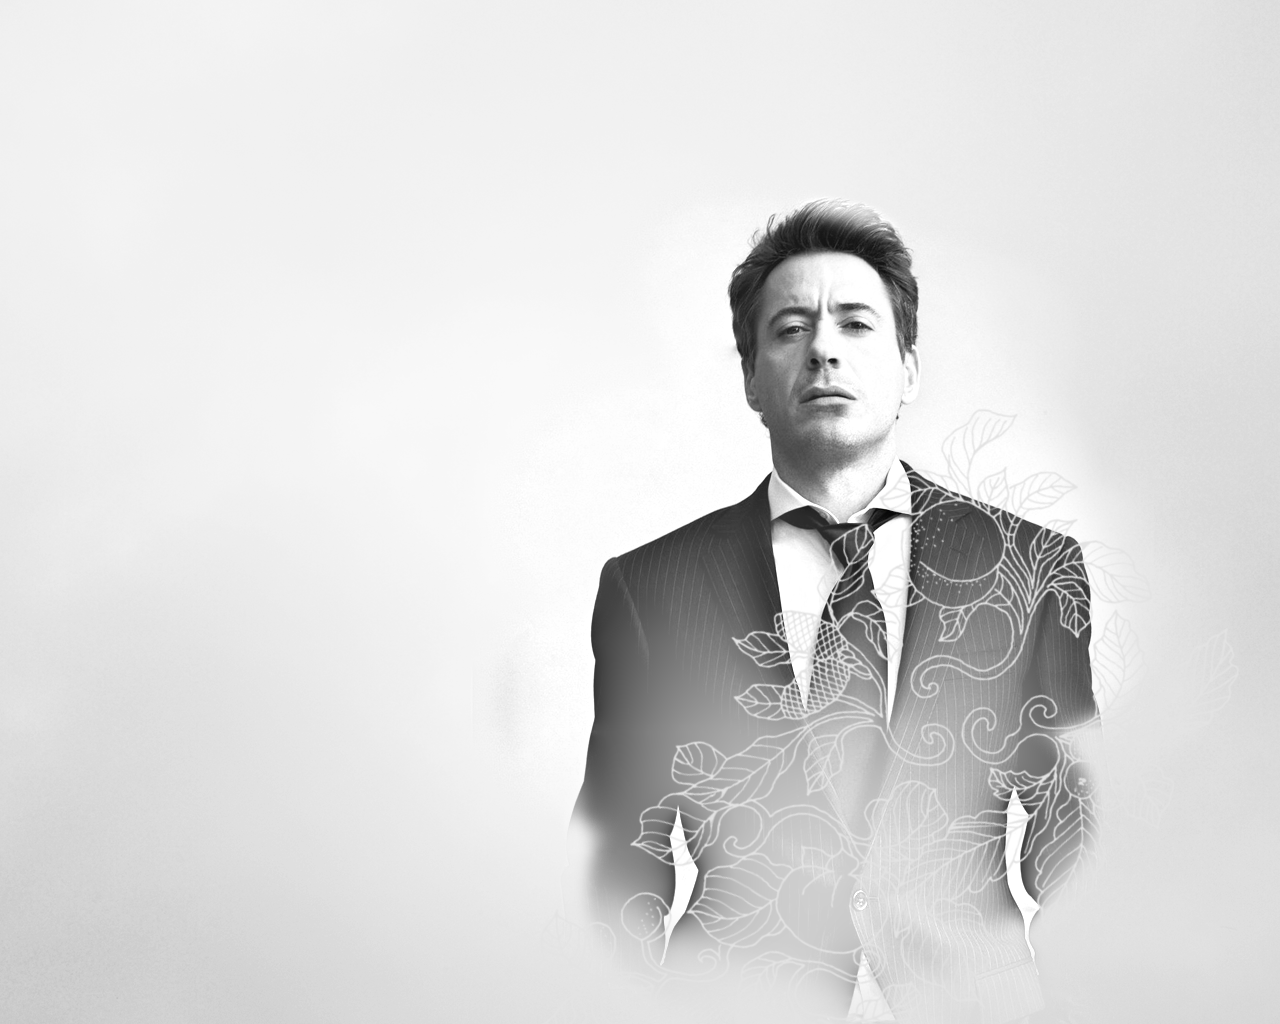 Robert Downey Jr Images Rdj Hd Wallpaper And Background Photos